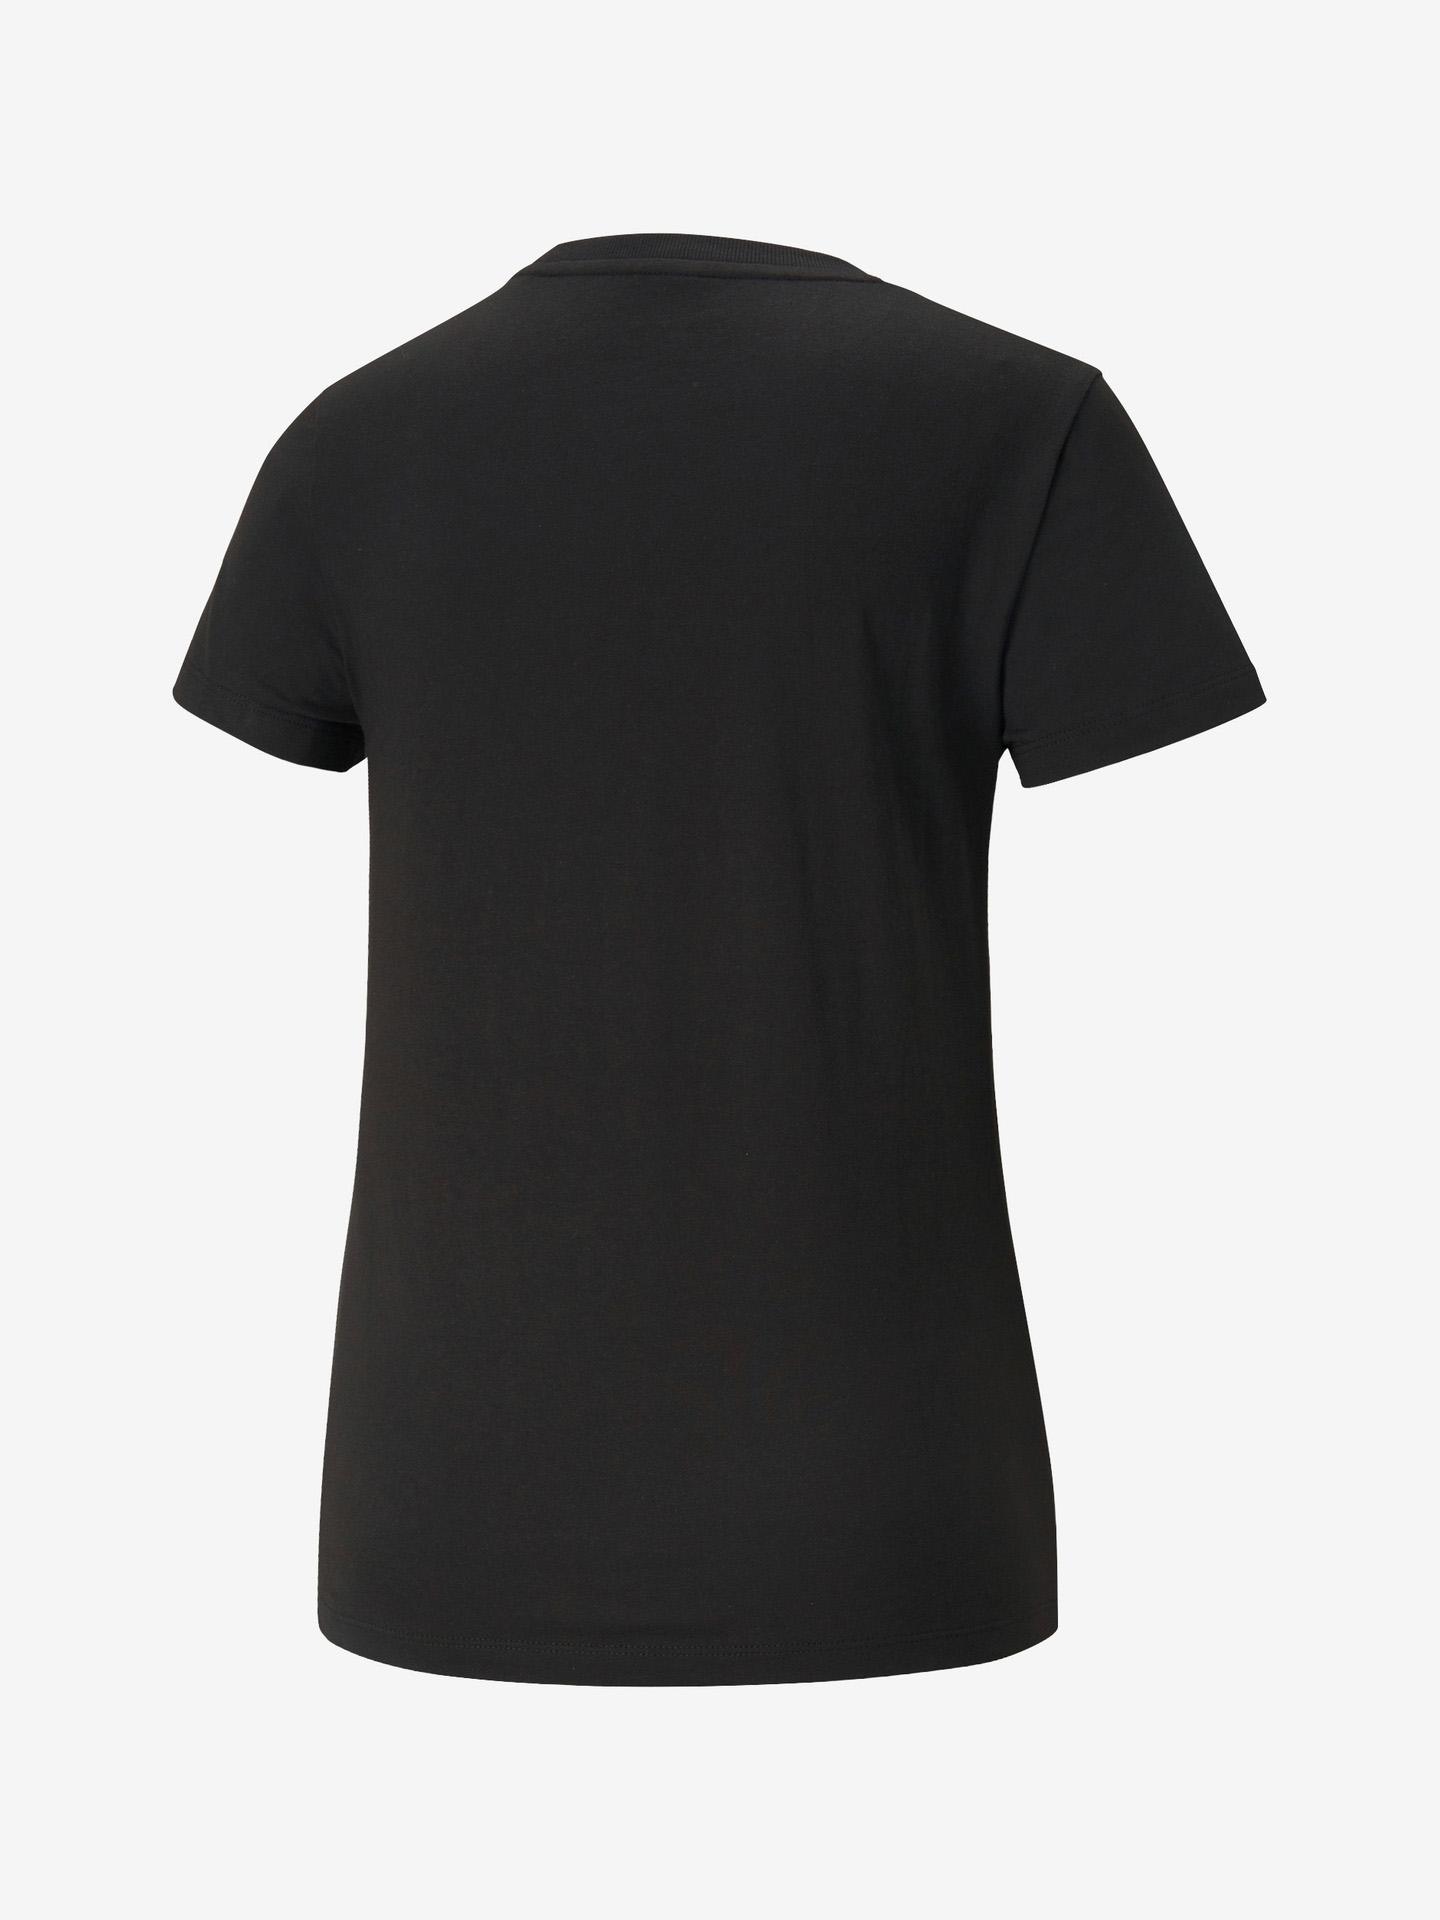 Puma INTL Graphic T-shirt Black